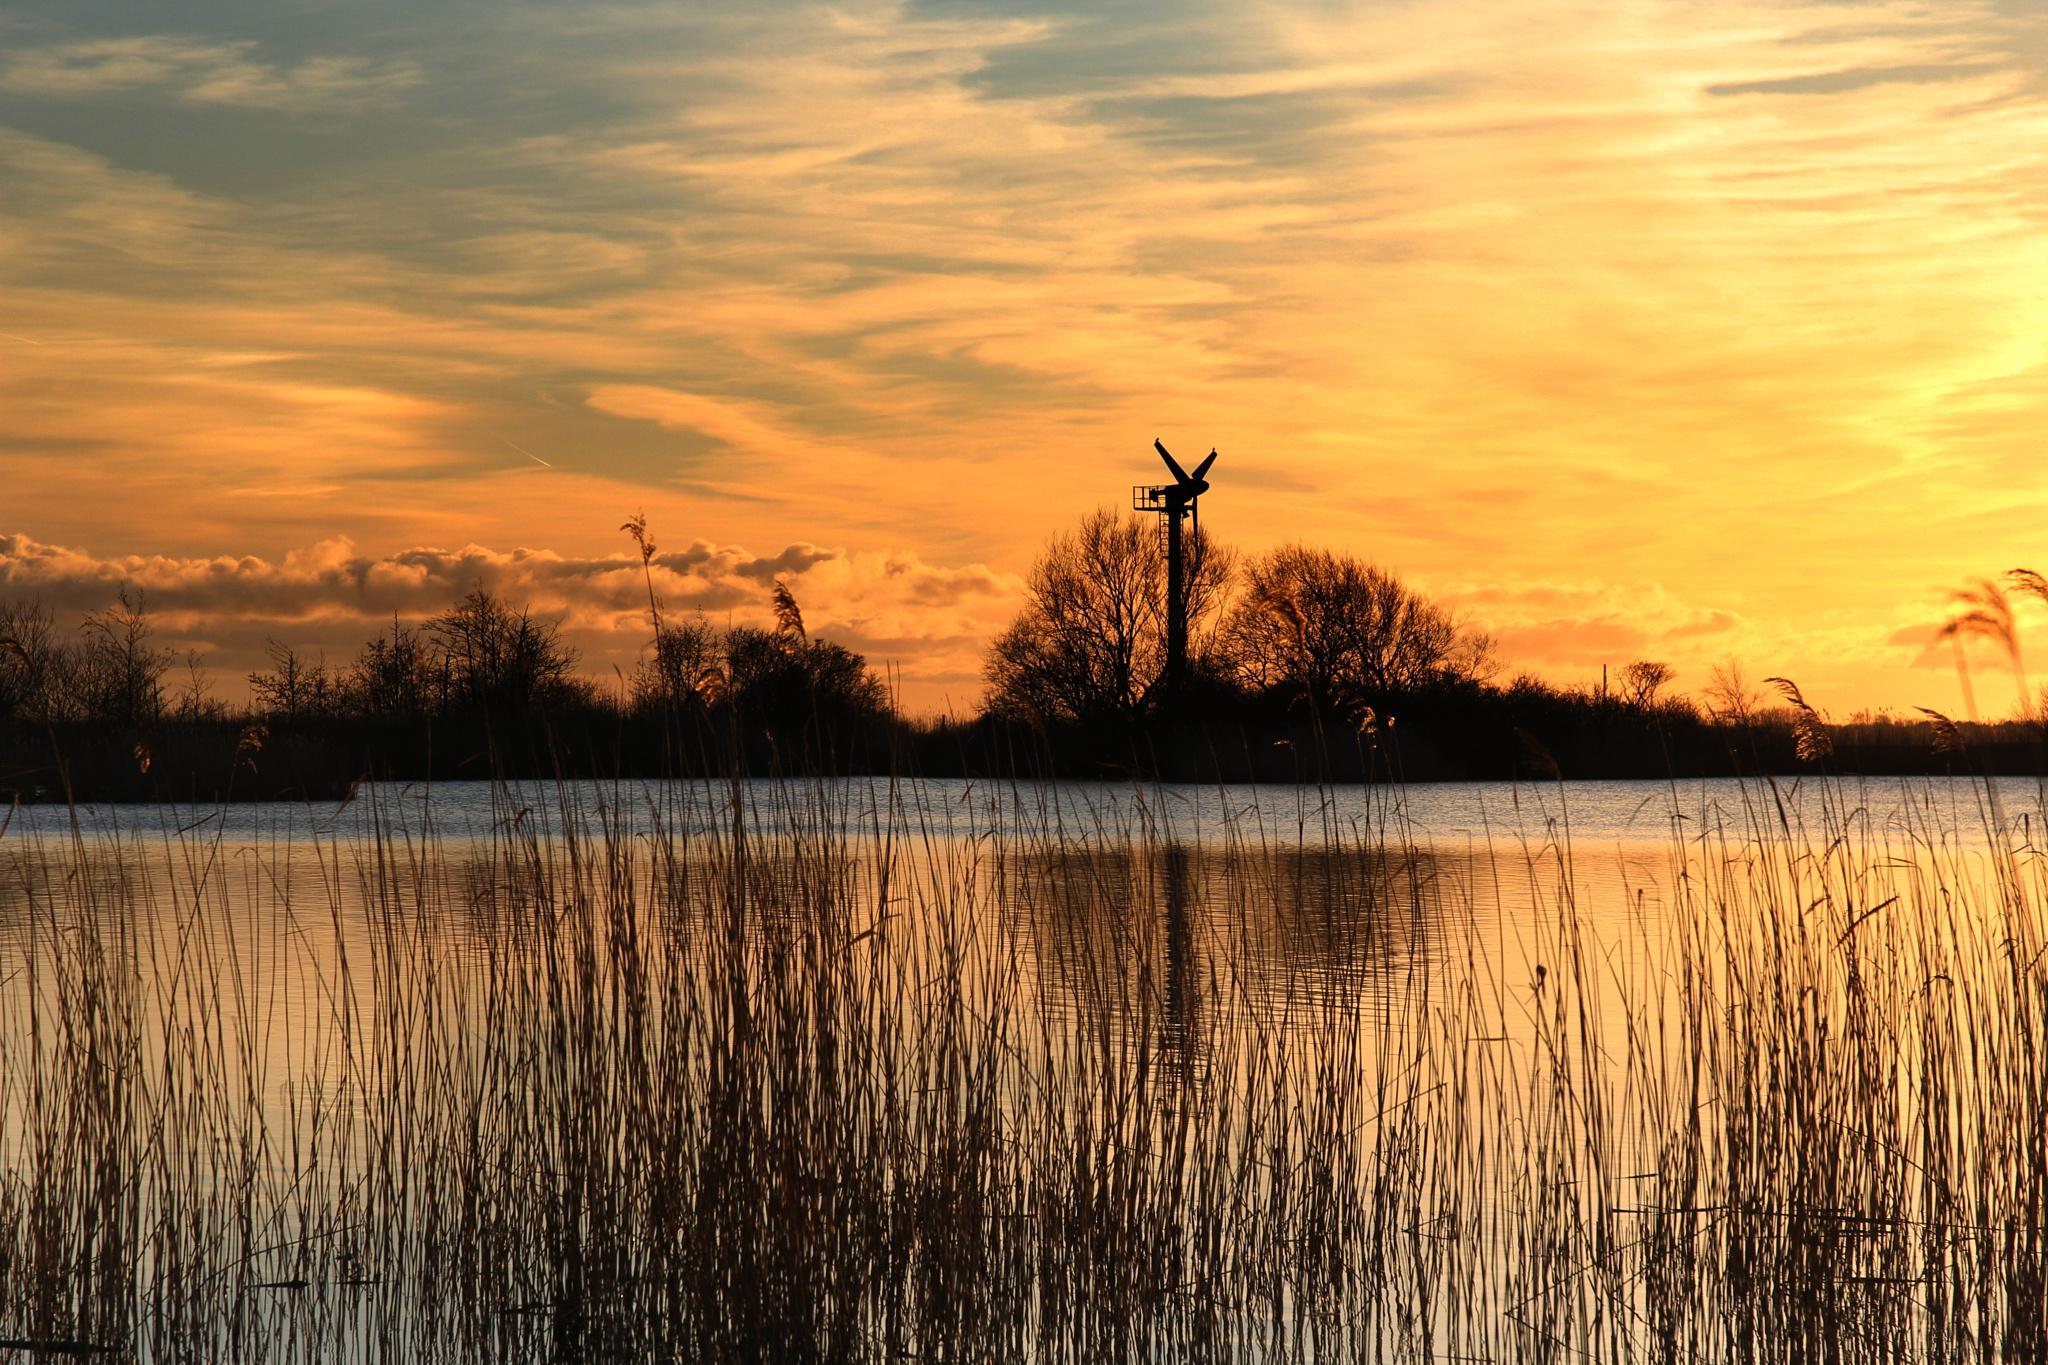 Lauwersoog Holland by Jan Henk